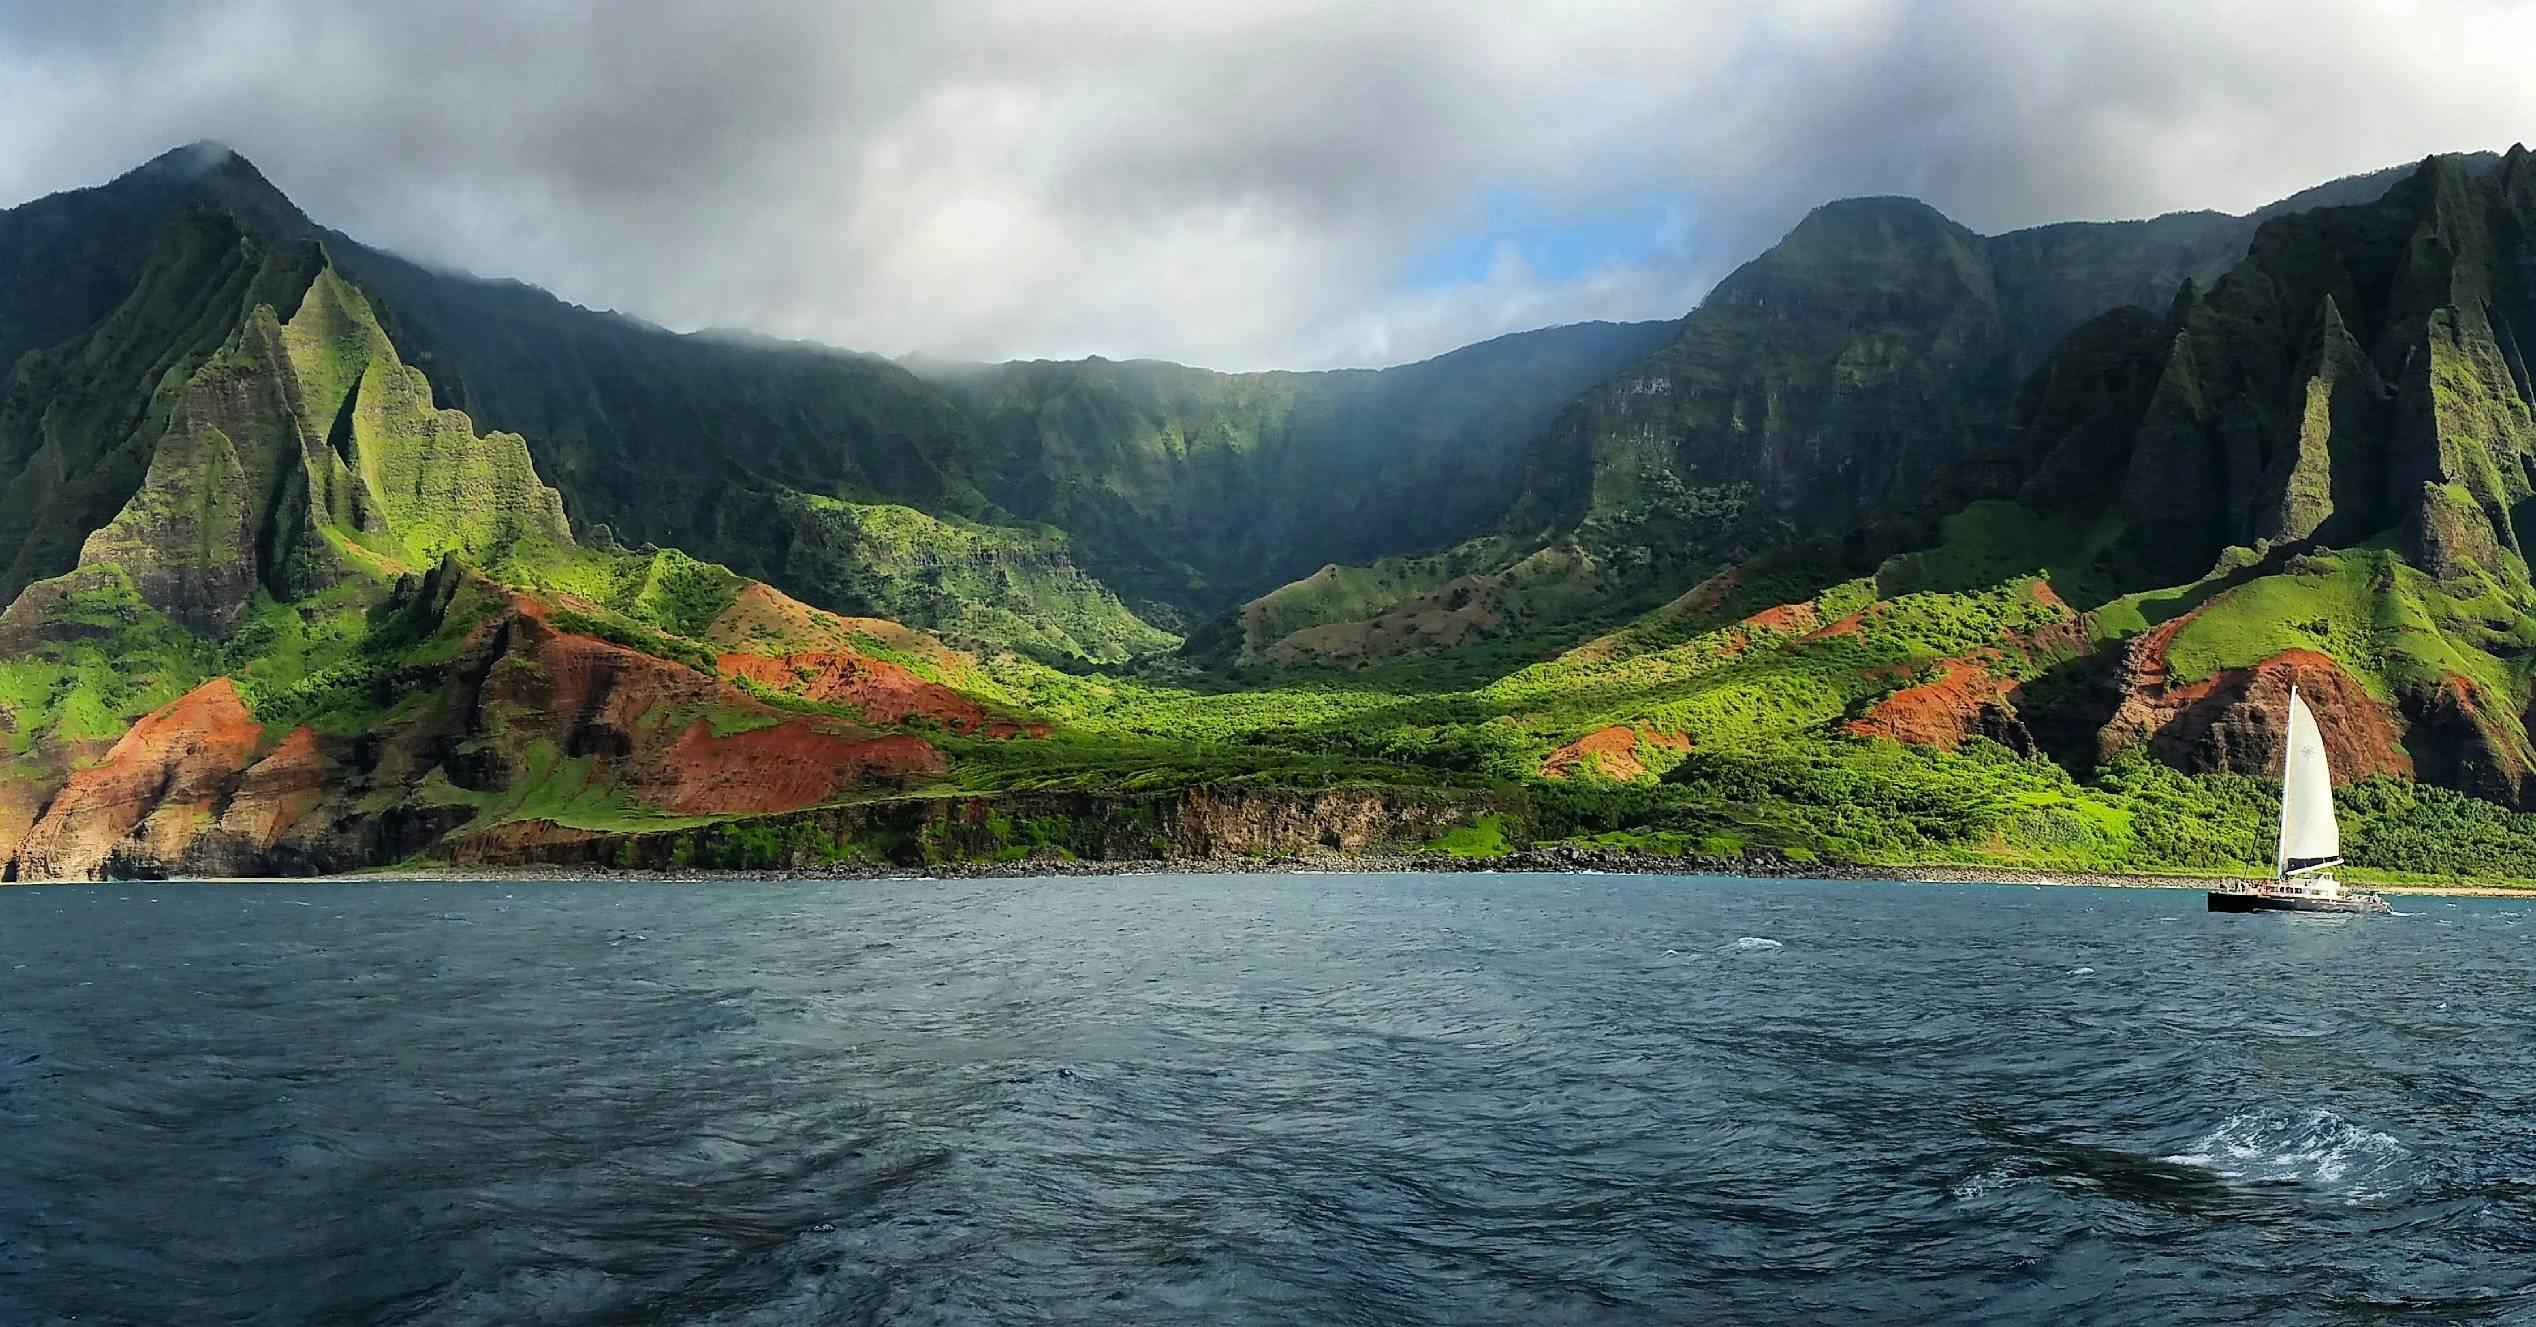 Napali Coast Kauai 14645 HD wallpaper 2536x1327